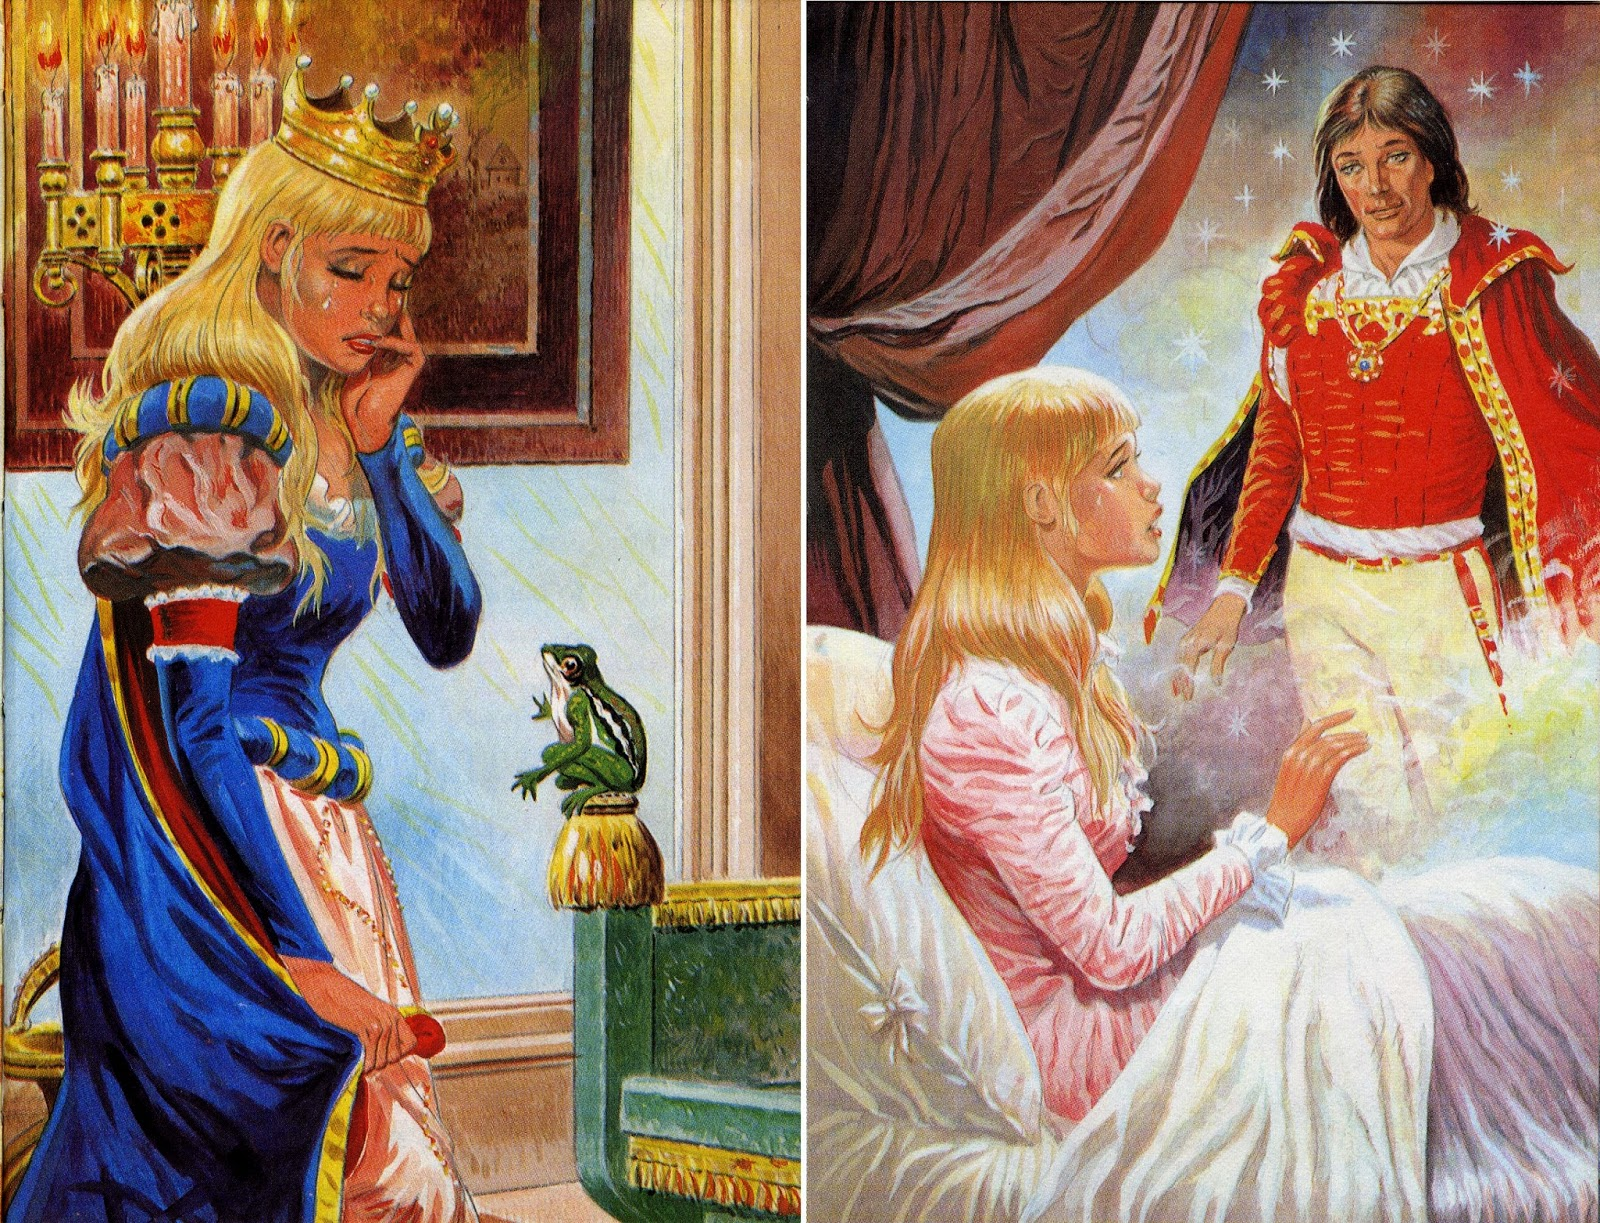 Bear Alley Mario Capaldi  The Princess and the Frog Ladybird 1973